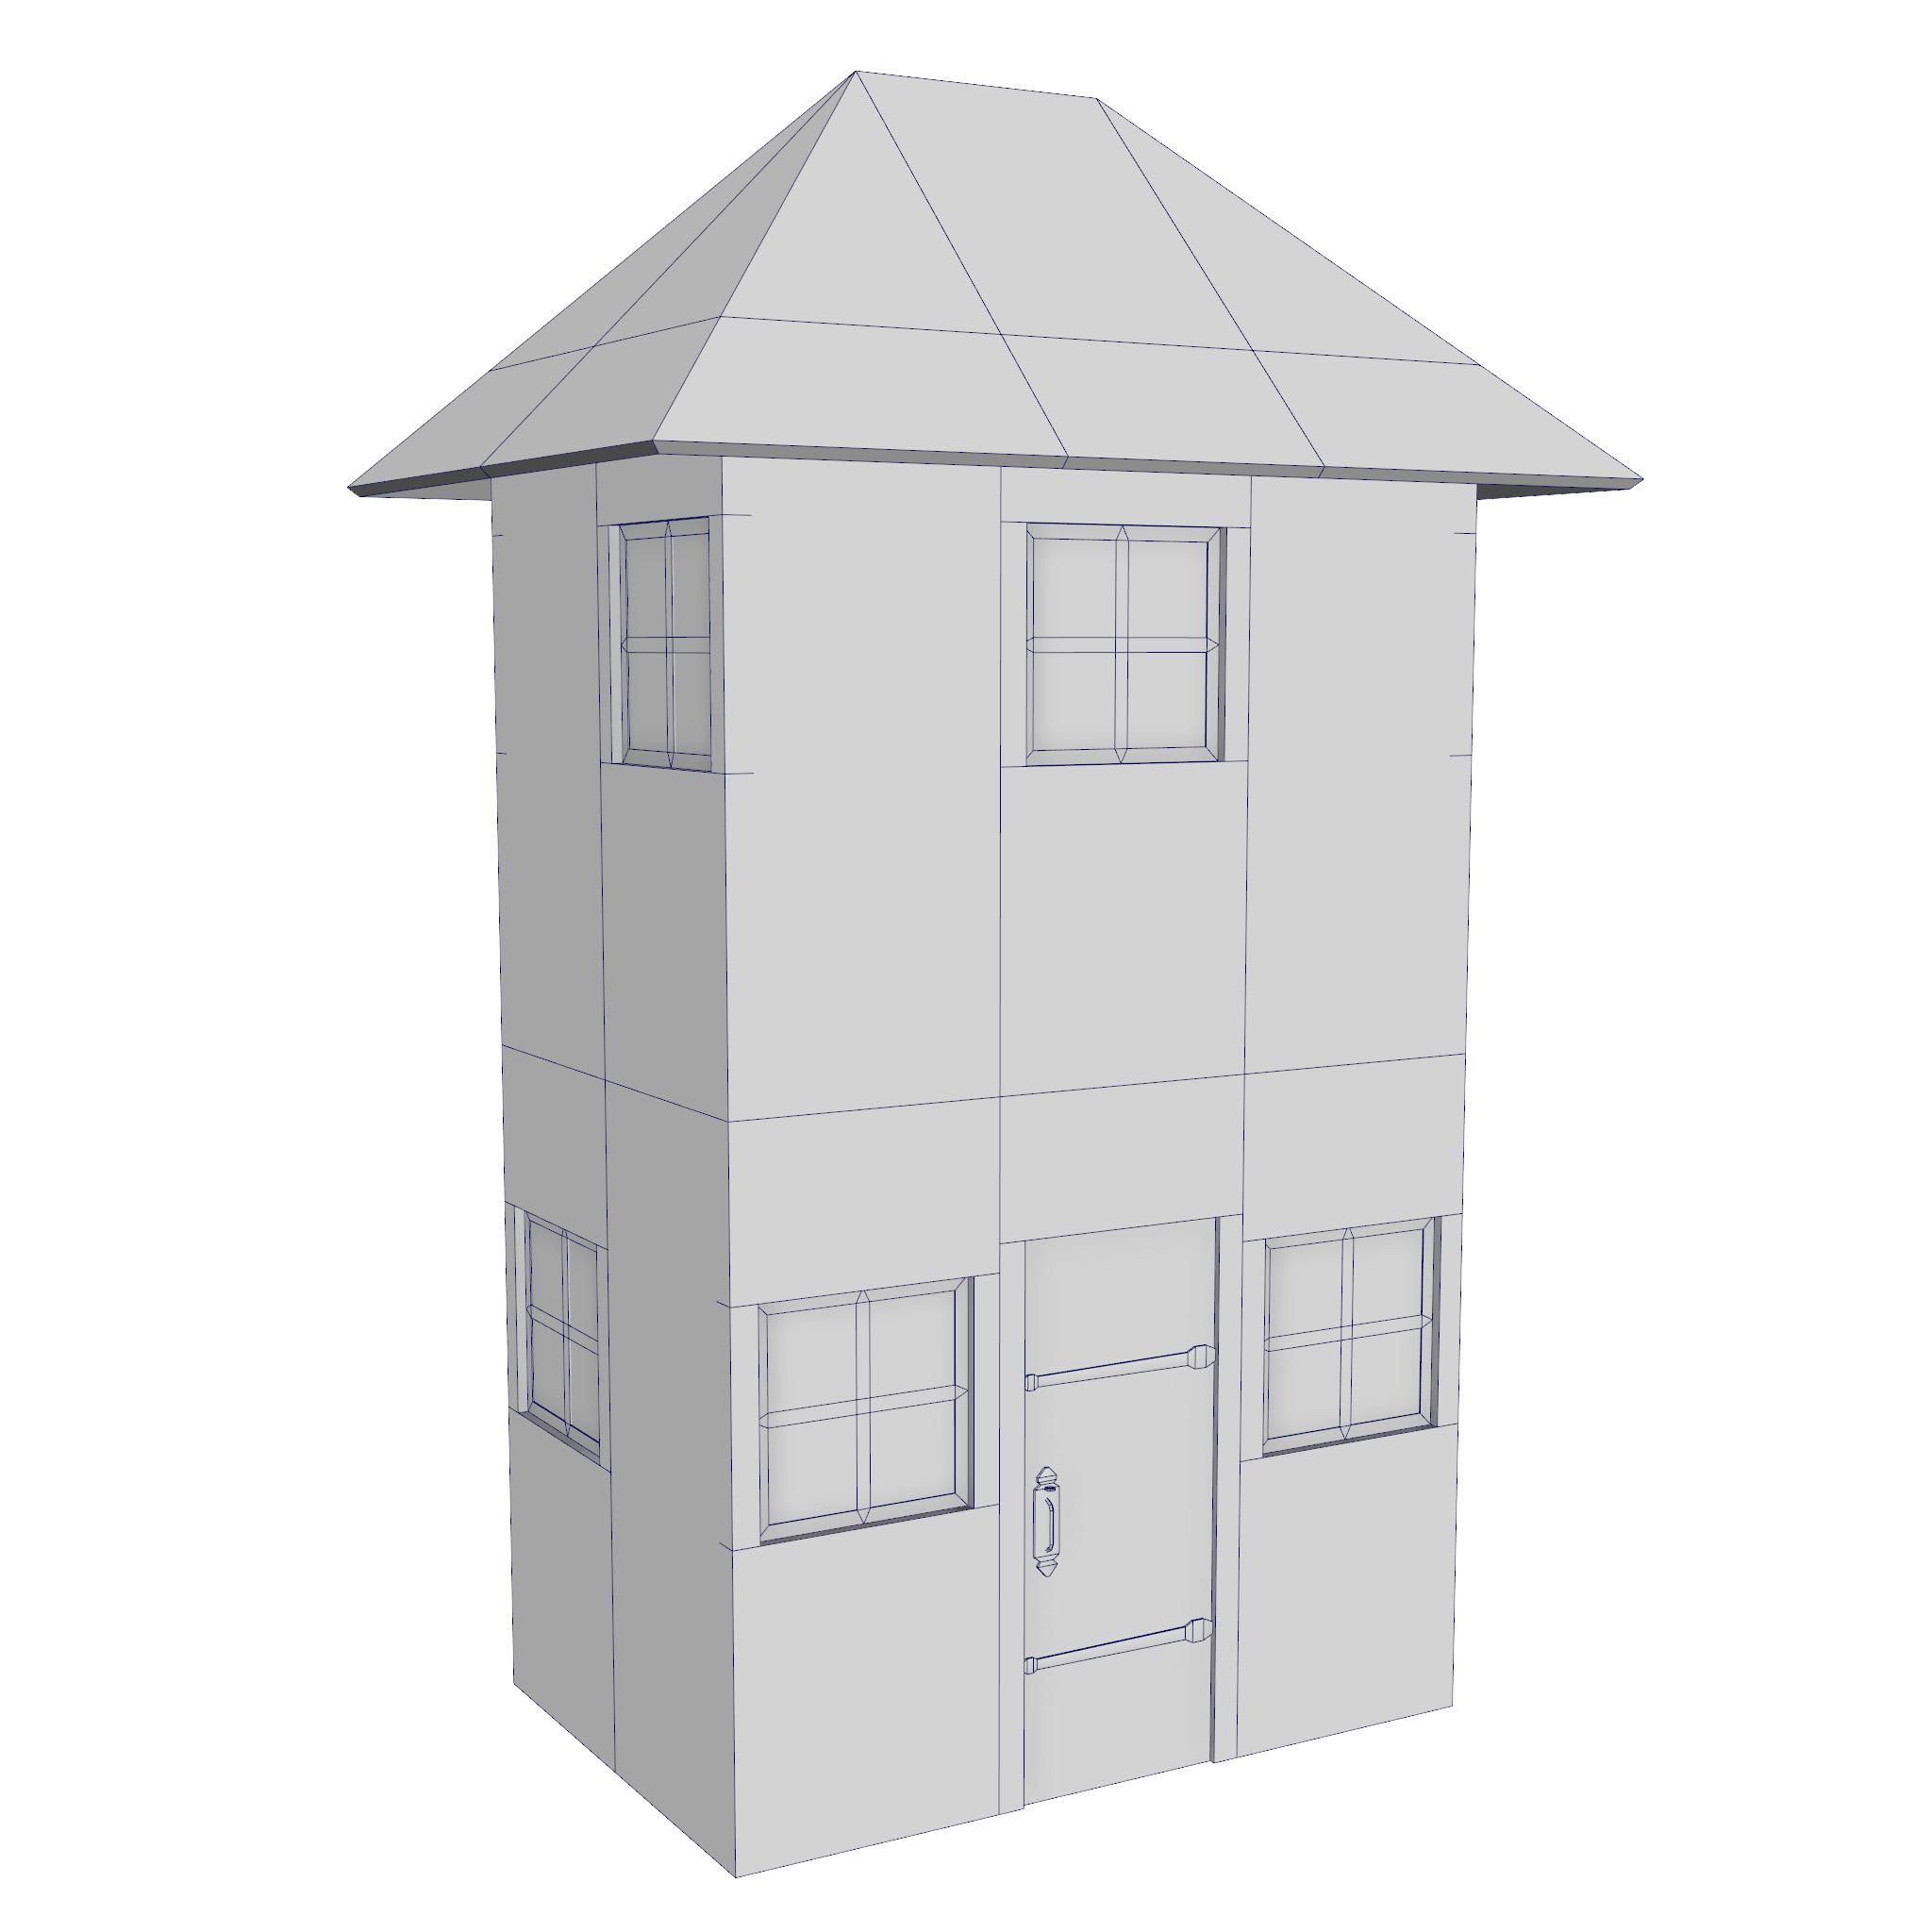 modular brick house set 3d model fbx ma mb 271403